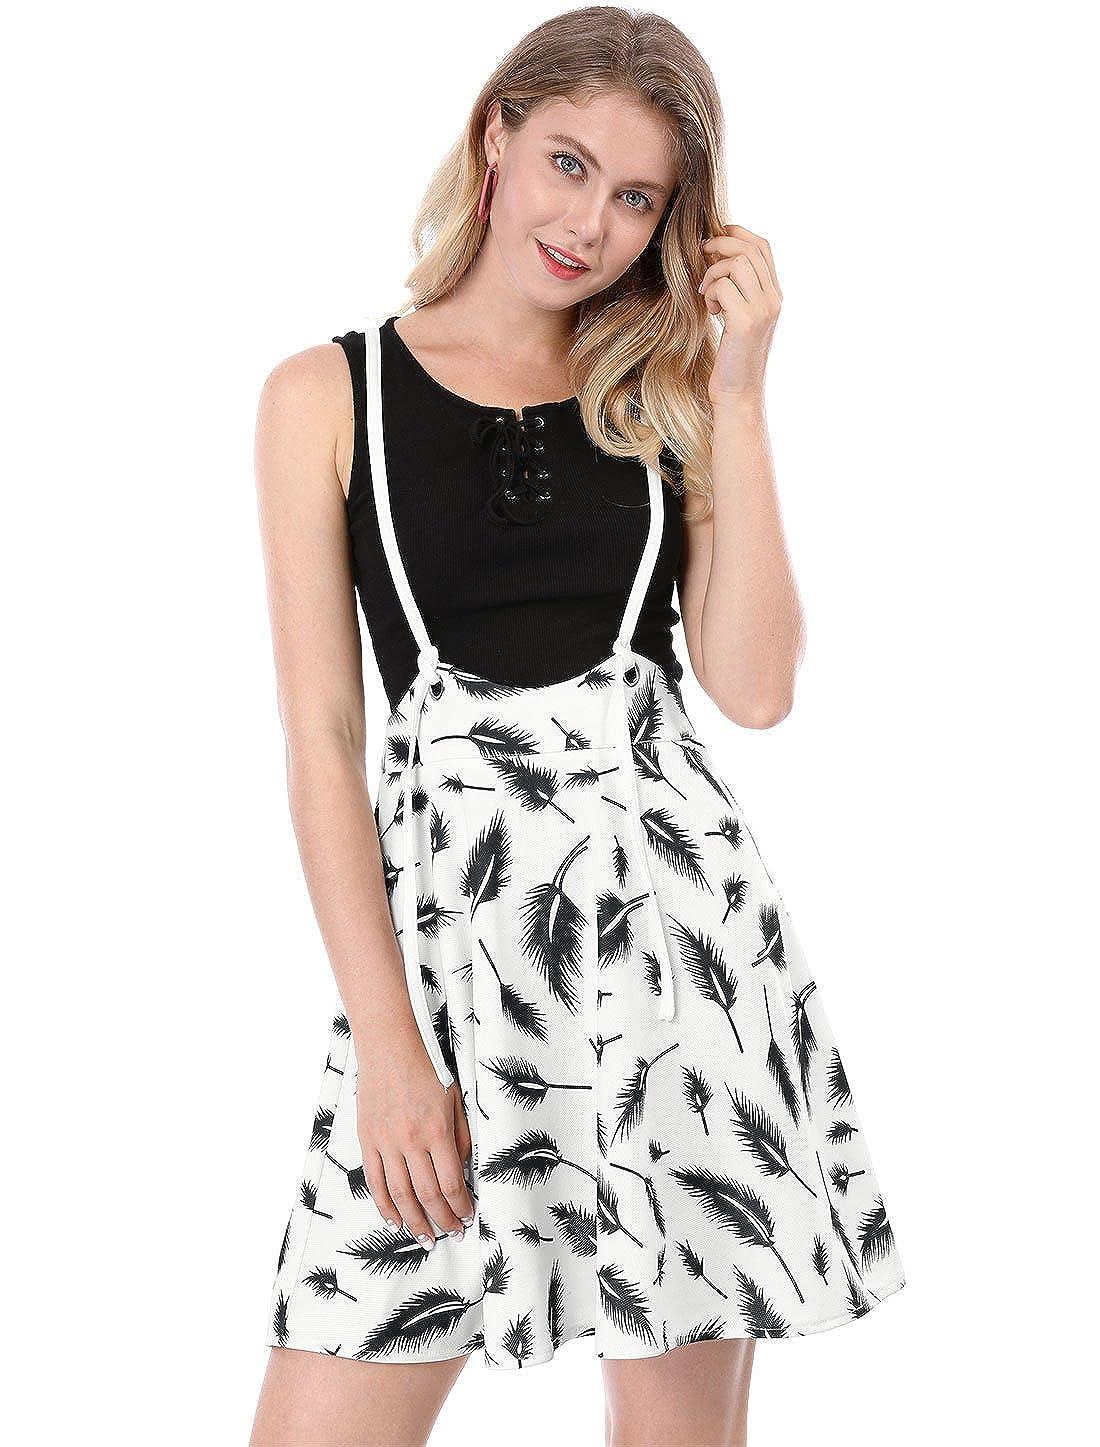 bad3ea5d338 Top 10 wholesale Suspender Shop - Chinabrands.com